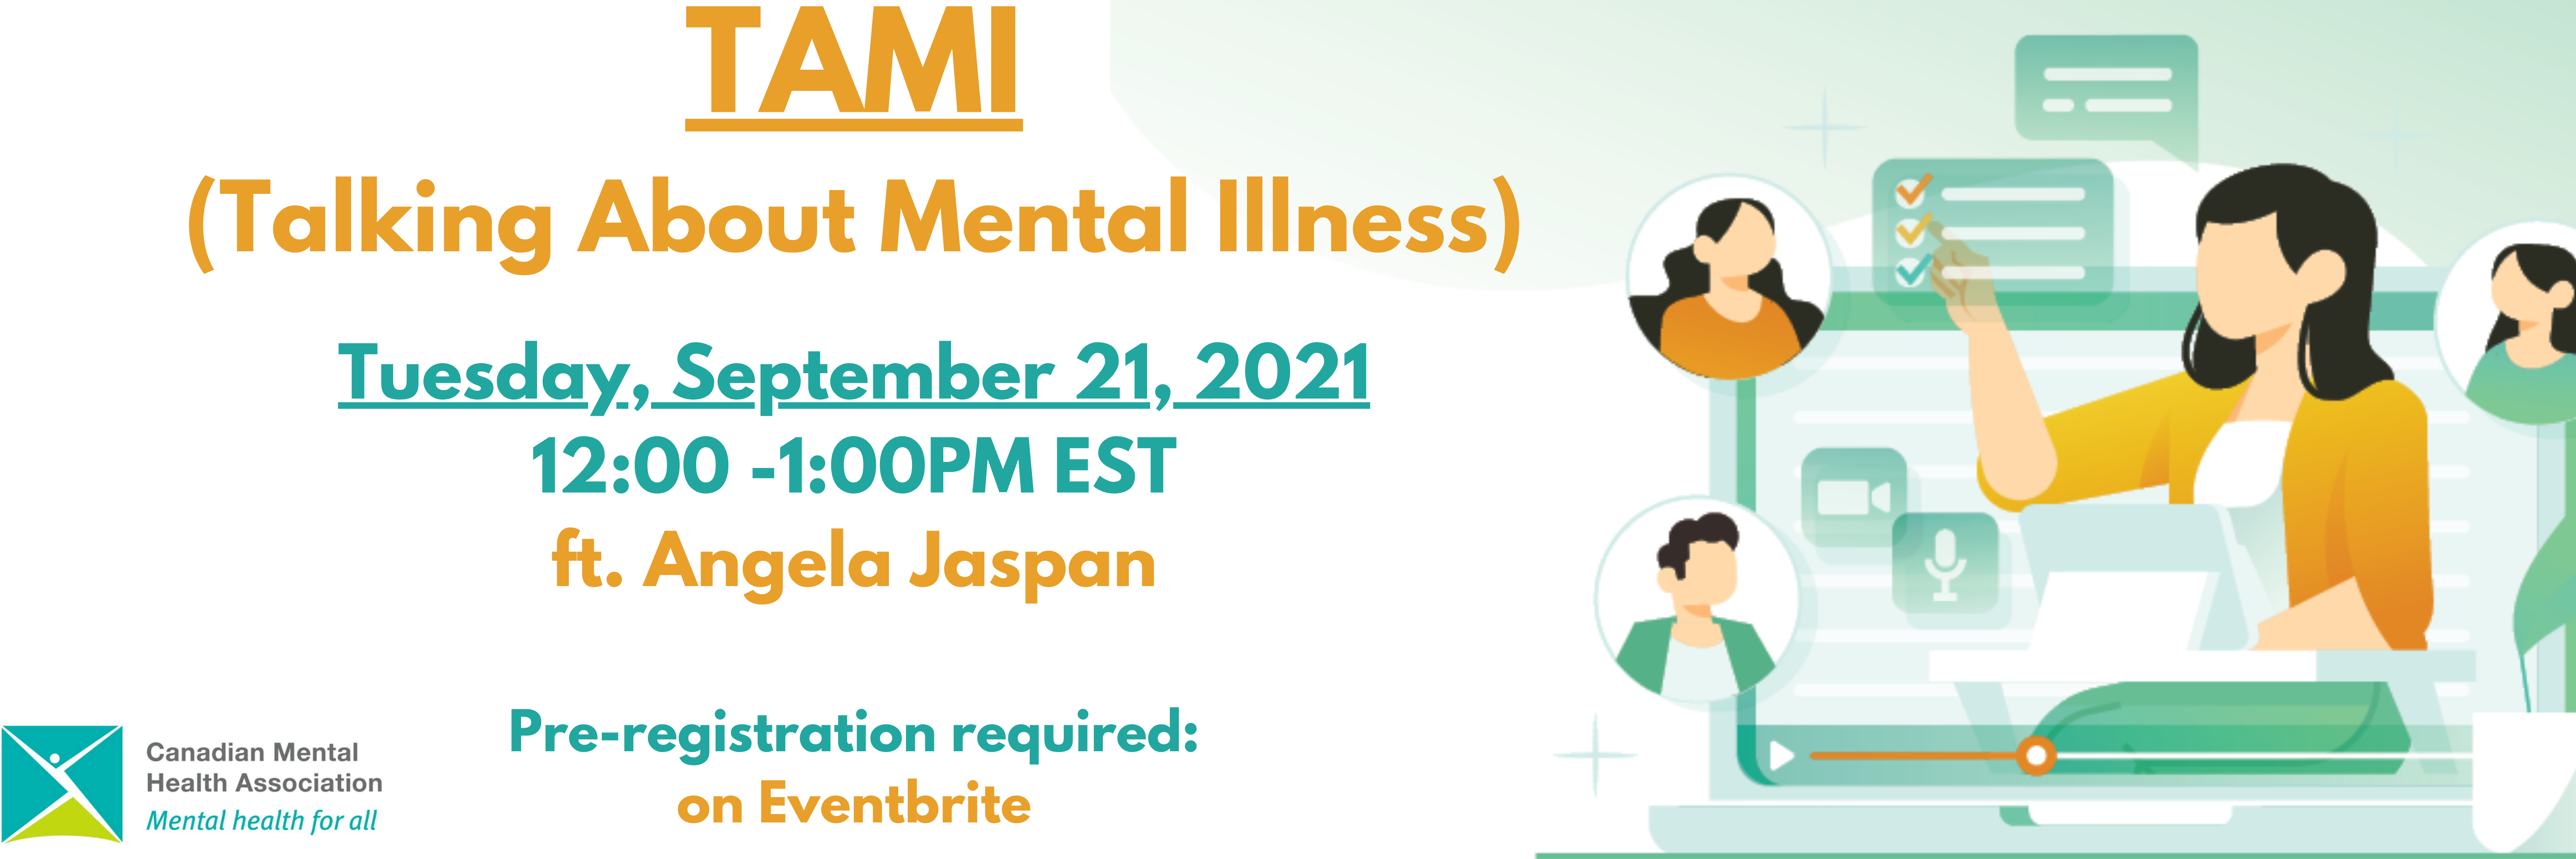 TAMI (Talking About Mental Illness) featuring Angela Jaspan